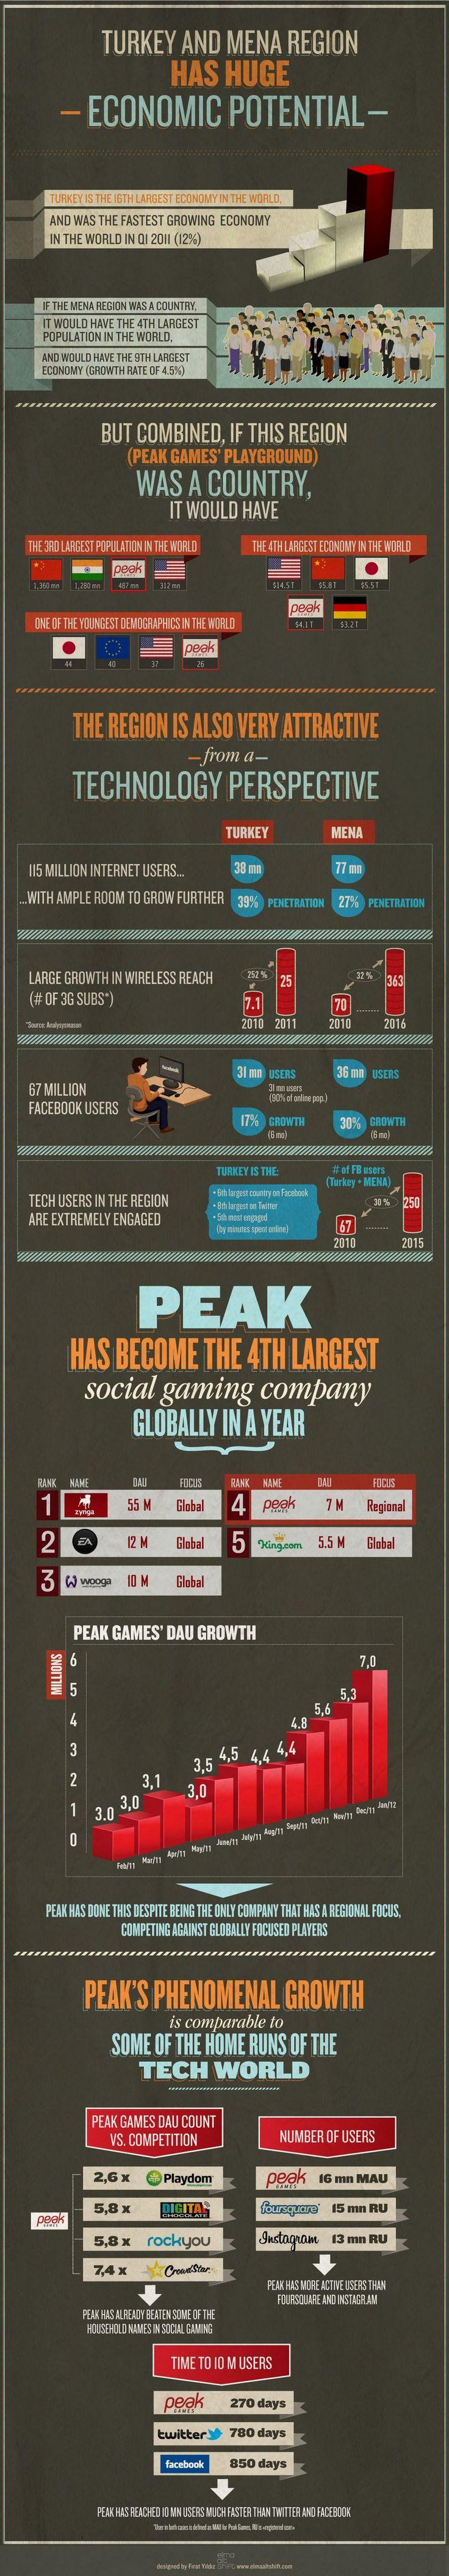 peakgames Peak games, Infographic, Social games